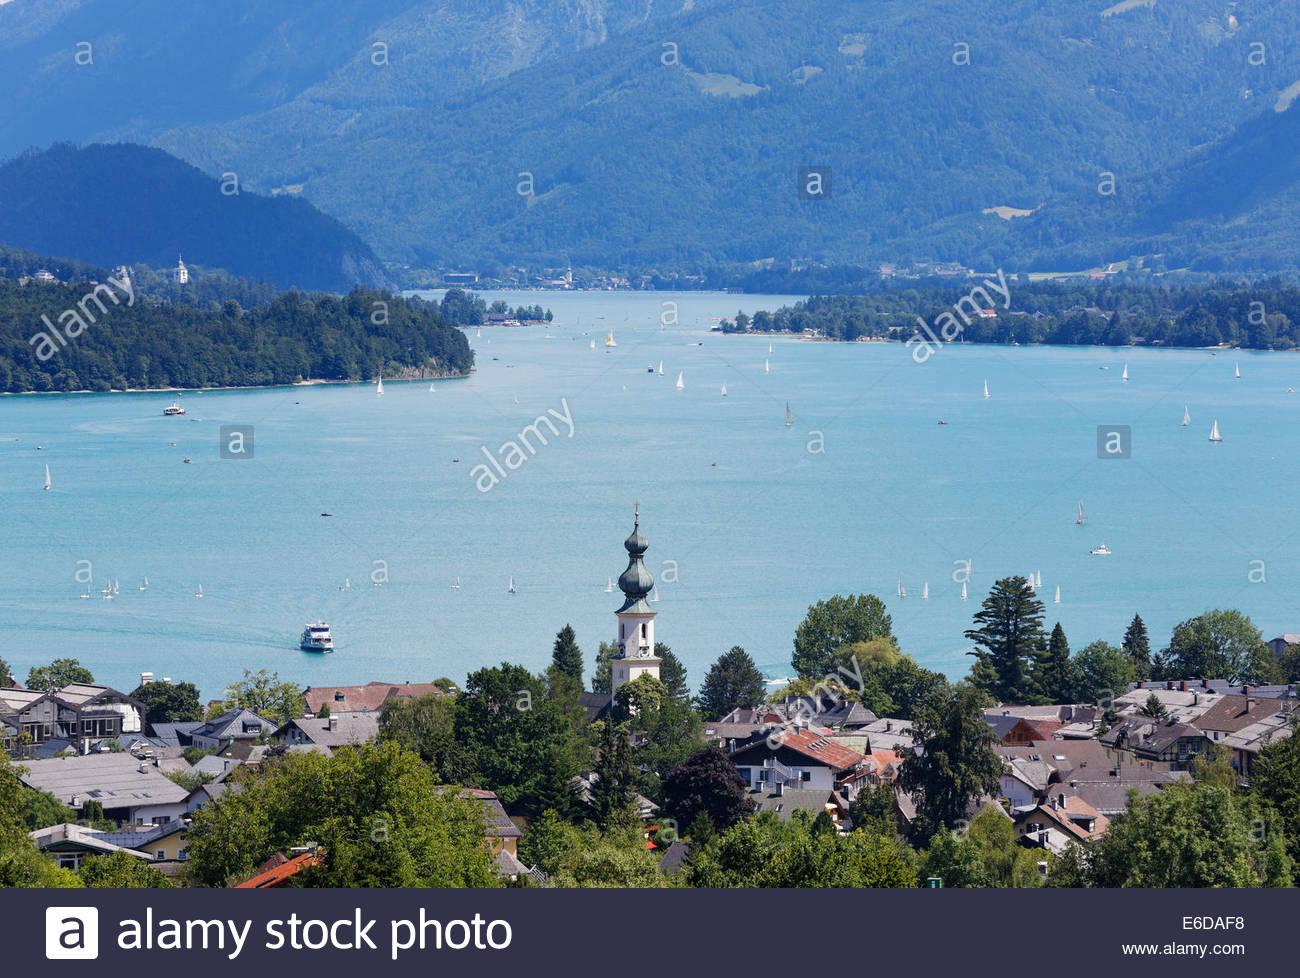 Austria, Salzkammergut, Salzburg State, Lake Wolfgangsee, St. Gilgen - Stock Image